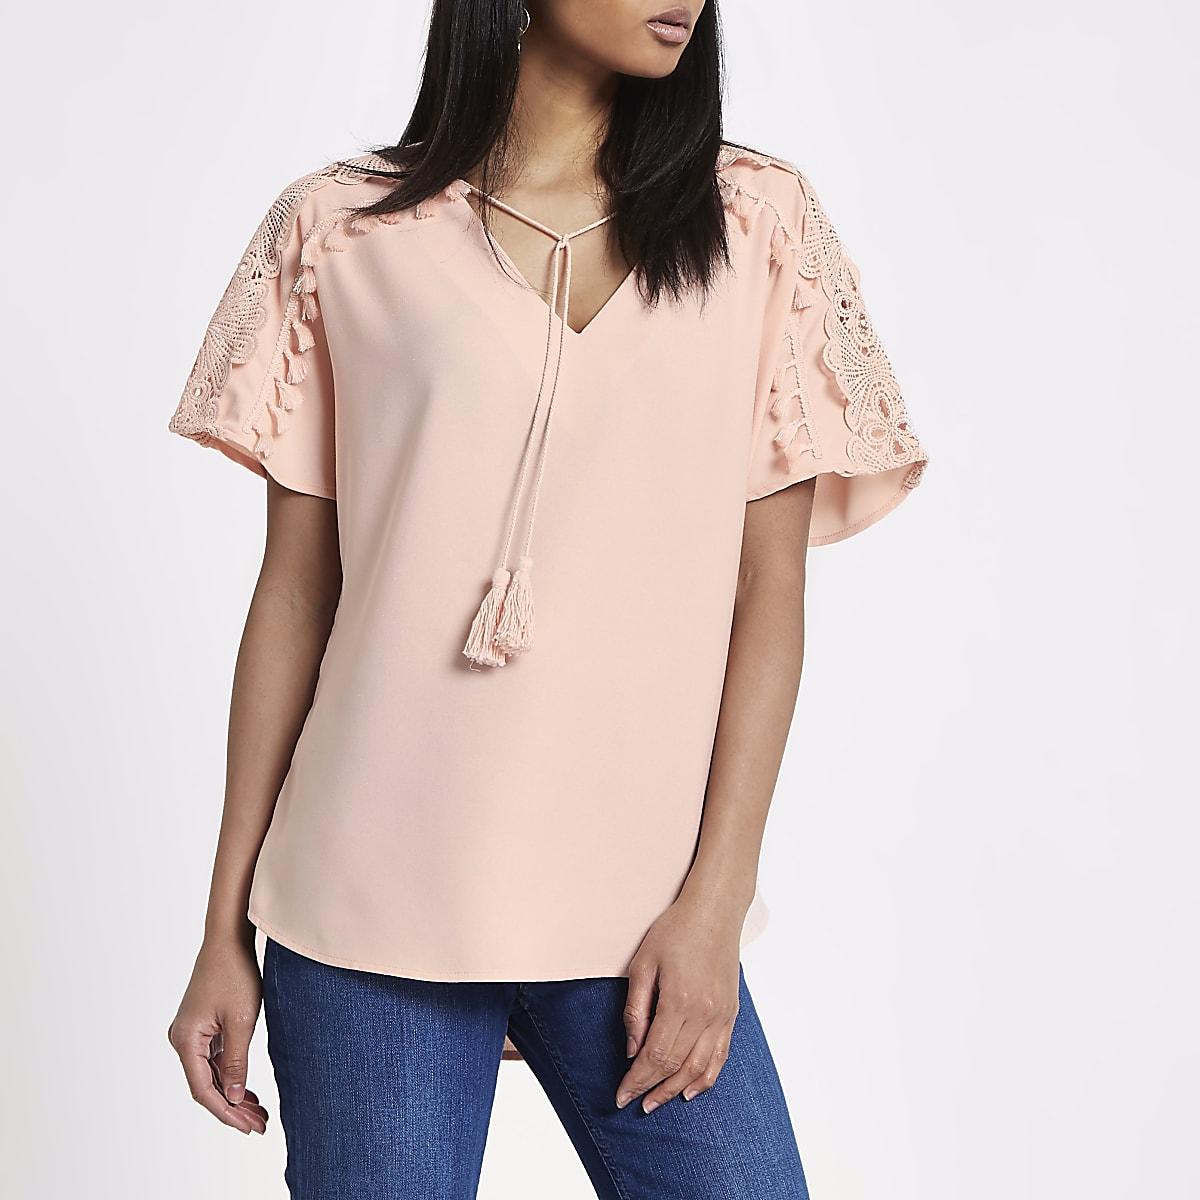 Light pink lace trim tassel top